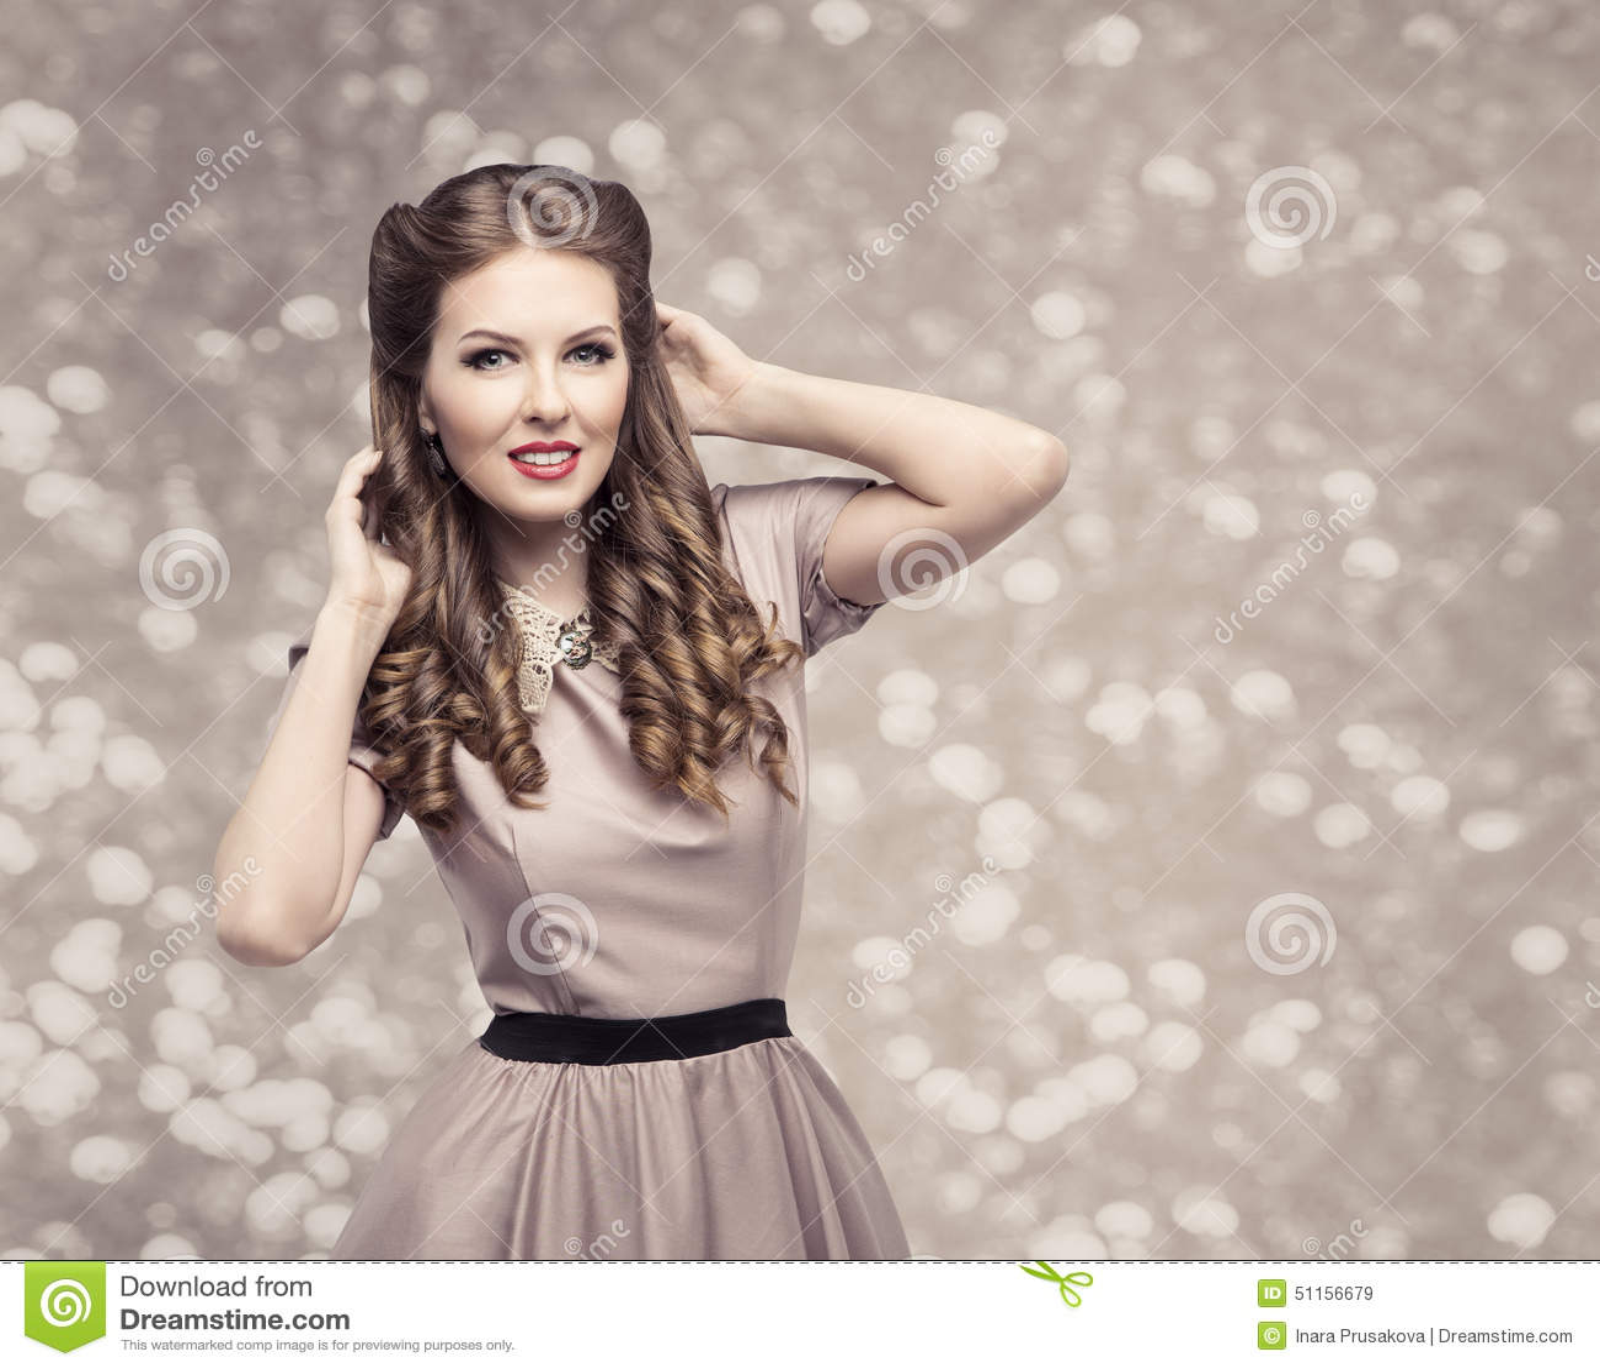 Retro Frauen Frisur Pin Up Girl Portrait Elegantes Modell